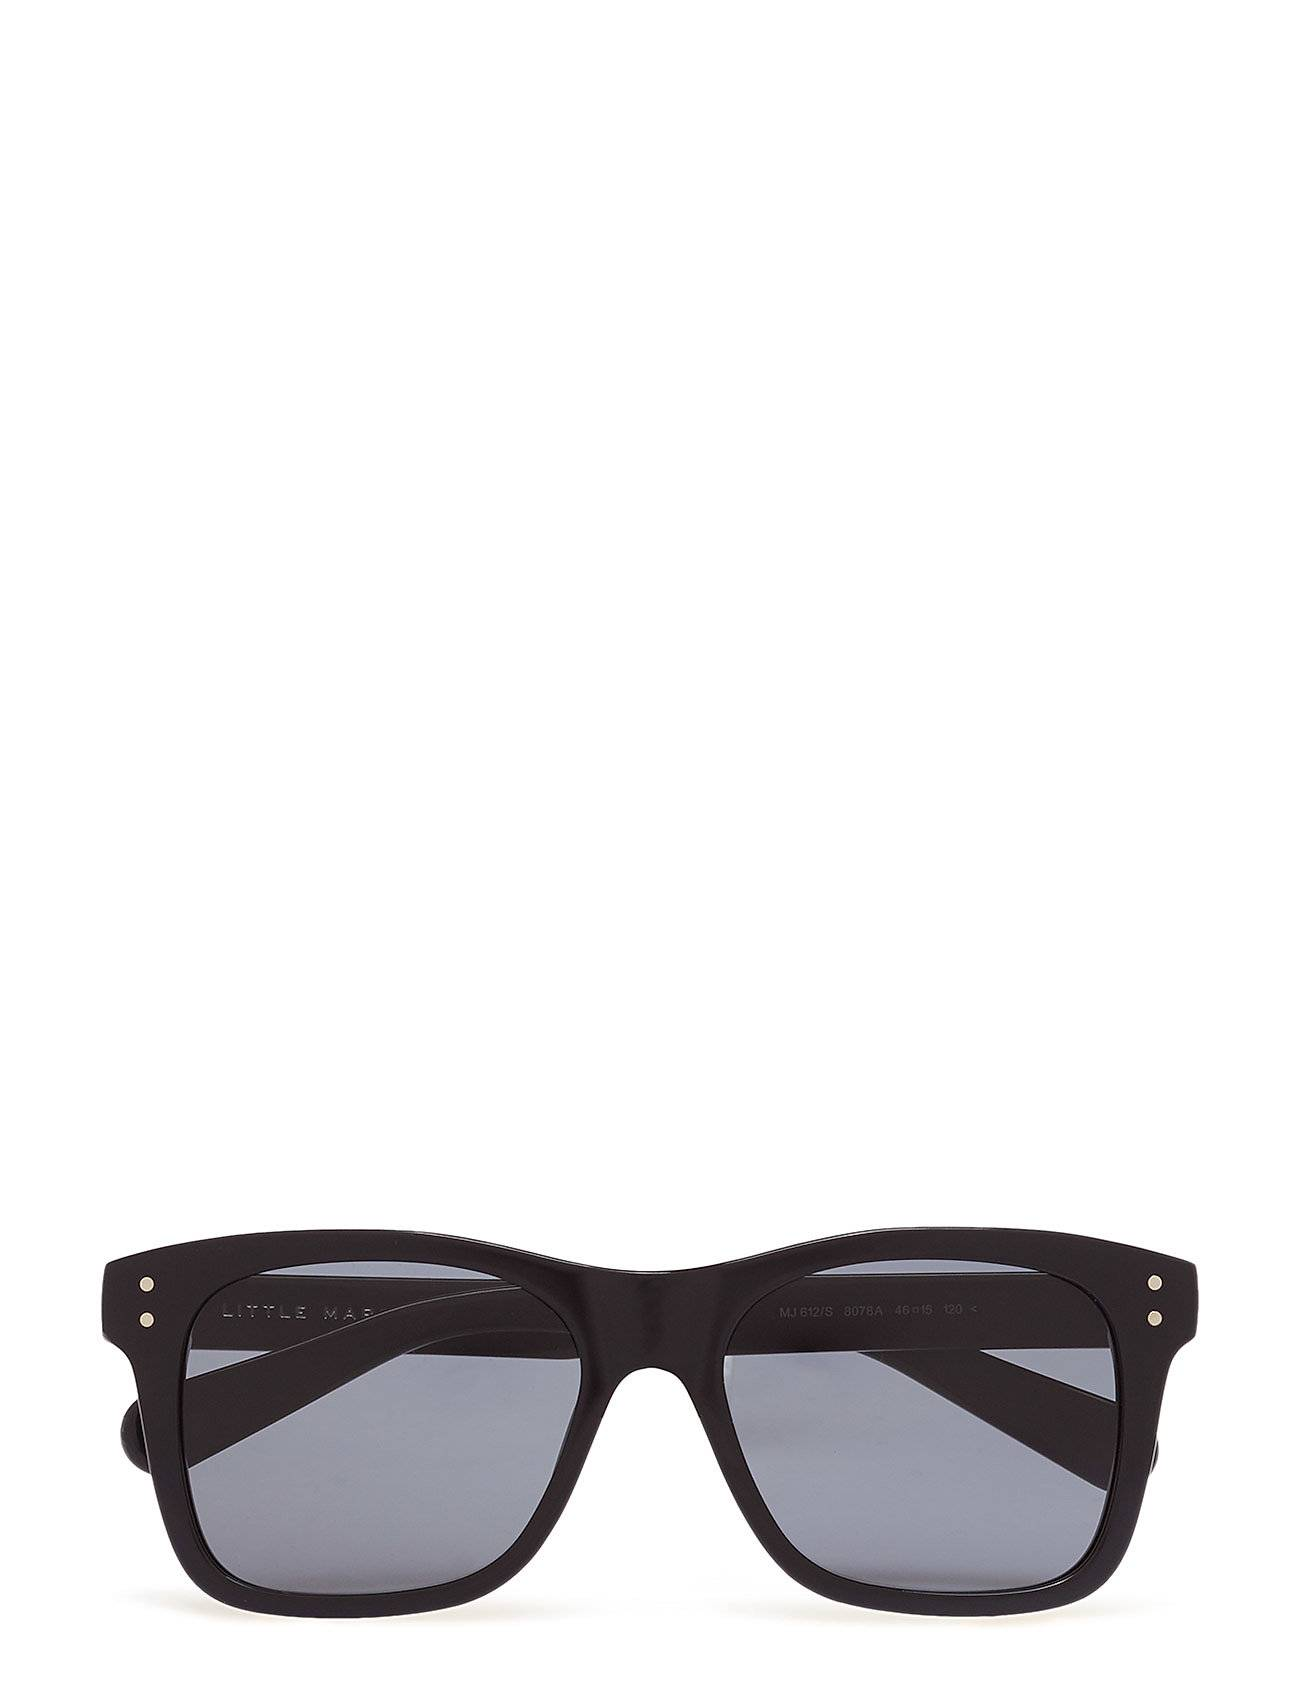 Image of Little Marc Jacobs Sunglasses Mj 612/S Aurinkolasit Musta Little Marc Jacobs Sunglasses